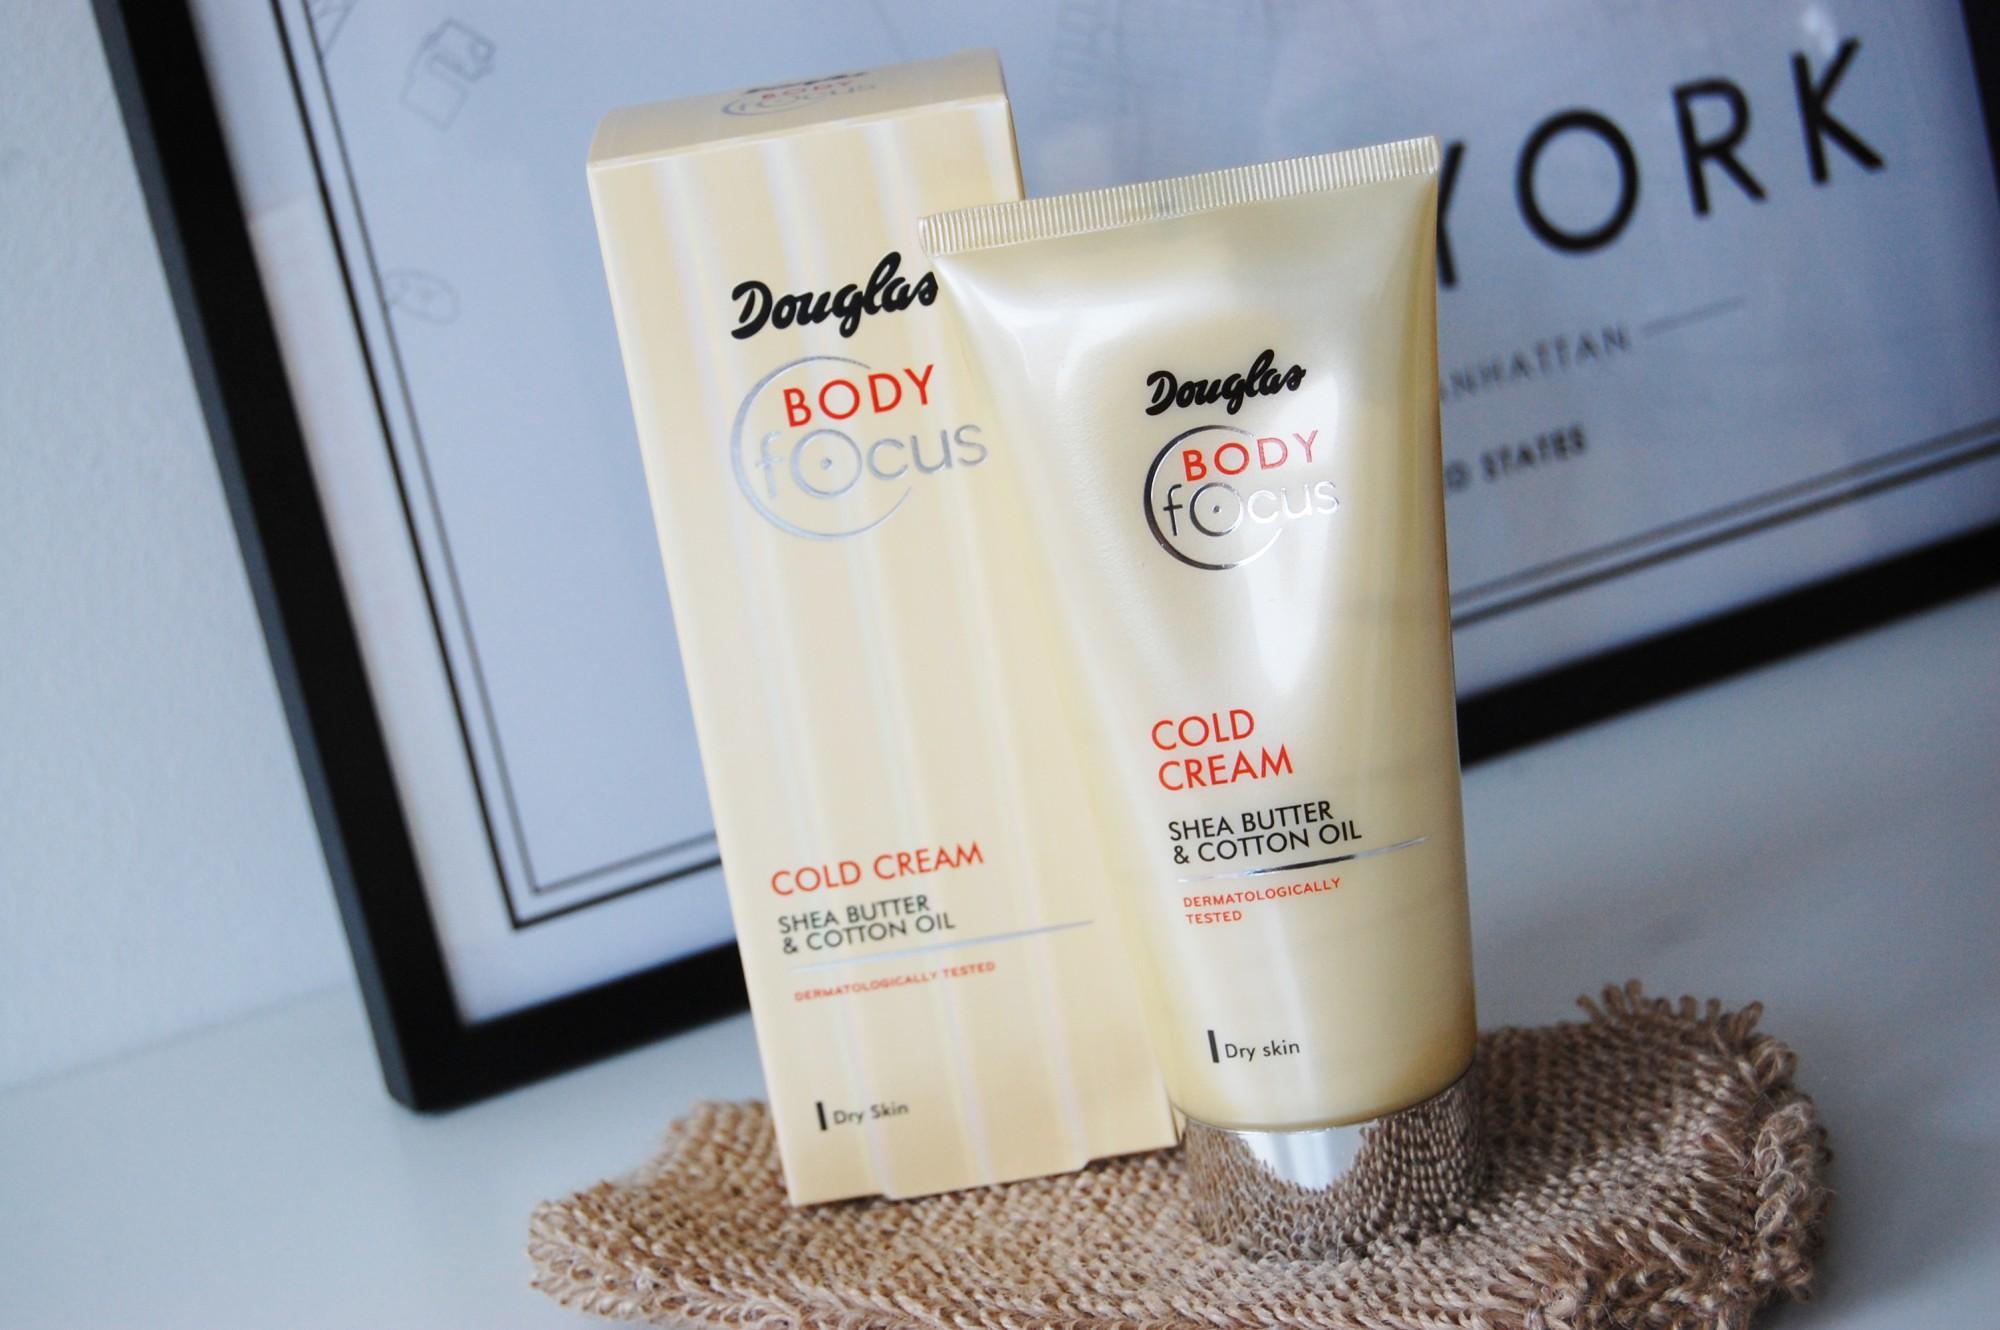 Douglas Body Focus